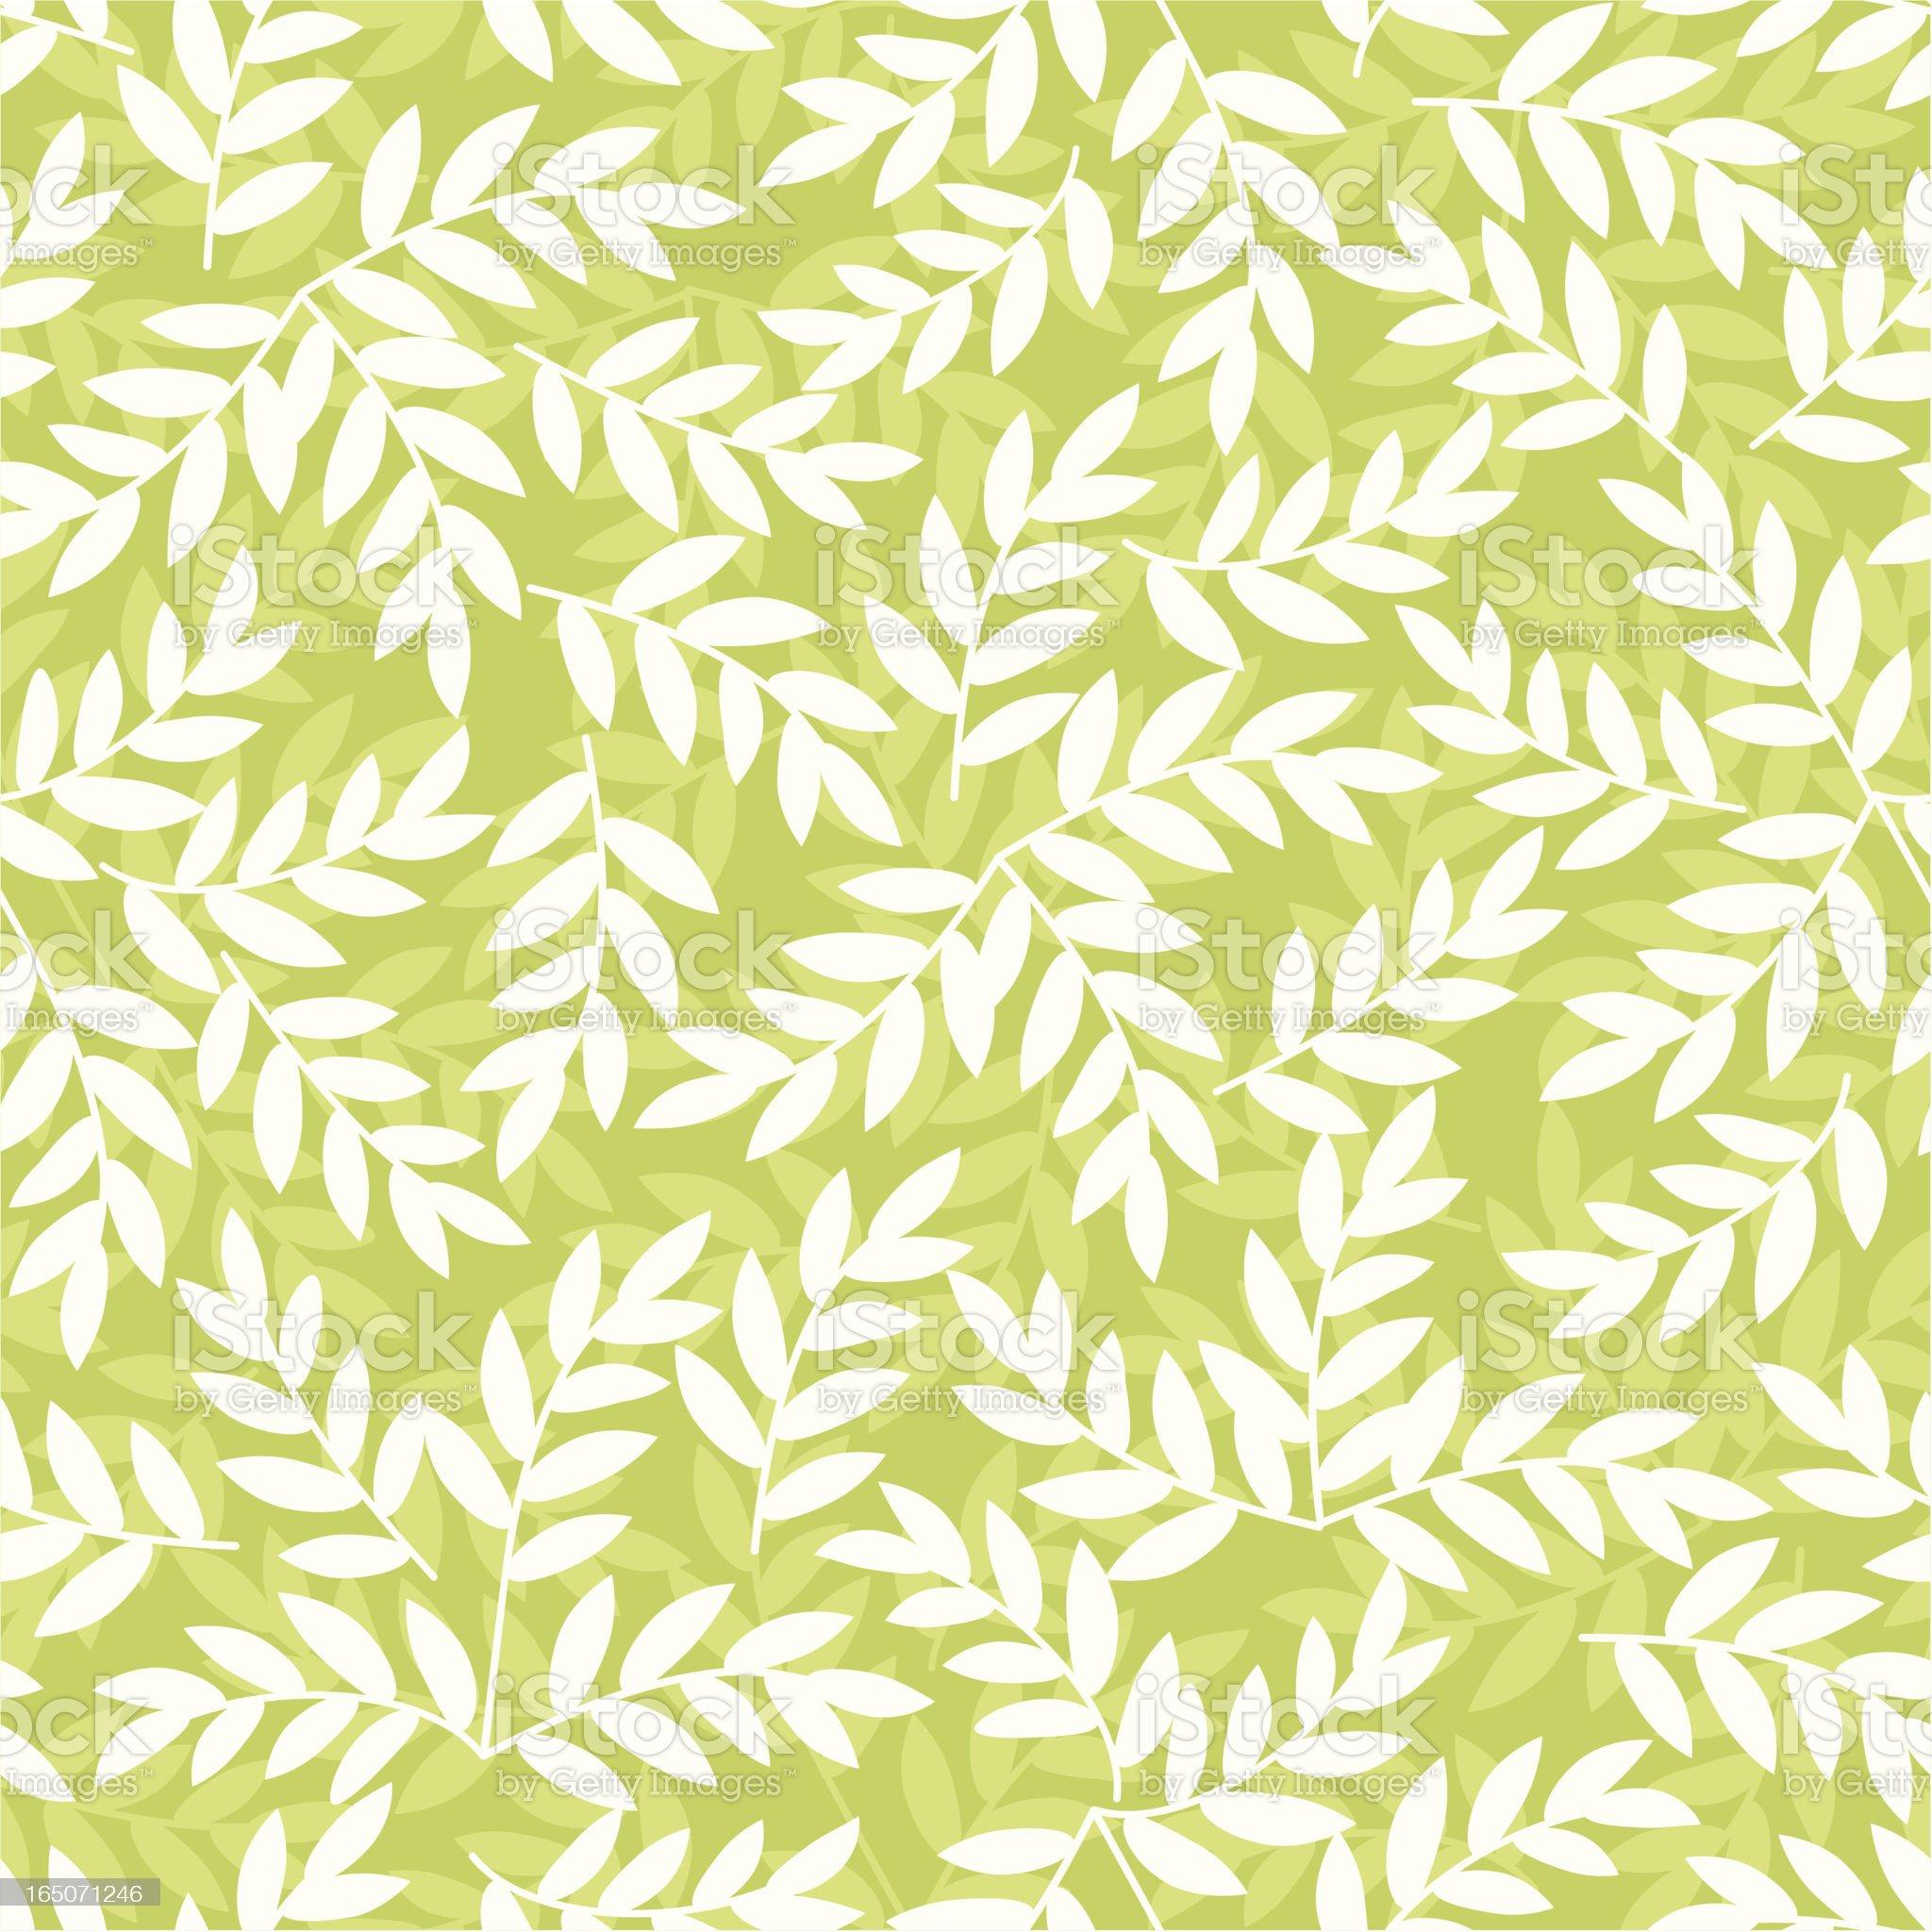 Leafy pattern . royalty-free stock vector art